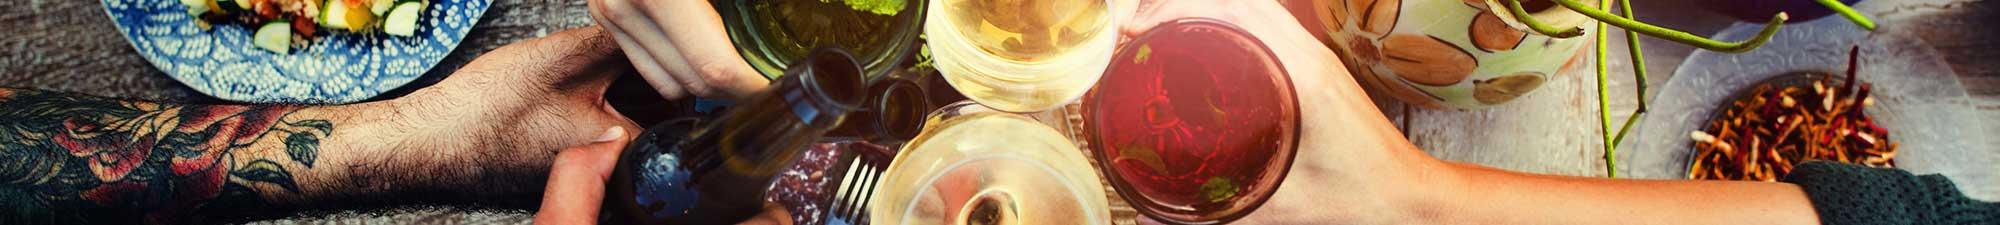 Bebidas e Garrafeira